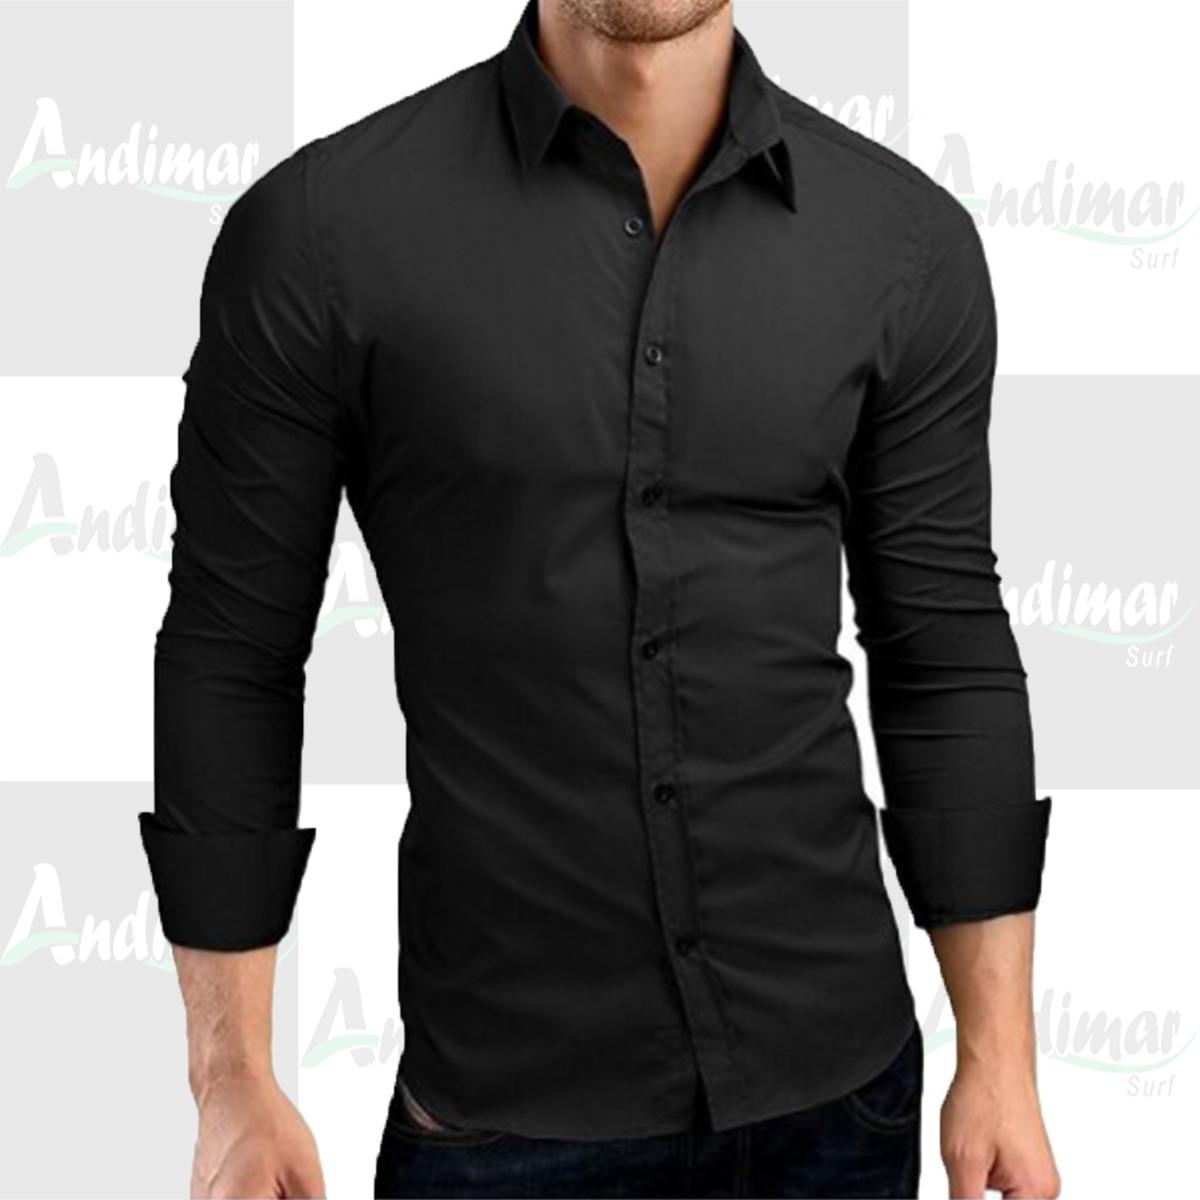 d49293bb42d4 kit 3 camisas masculinas social slim fit preta manga longa. Carregando zoom.